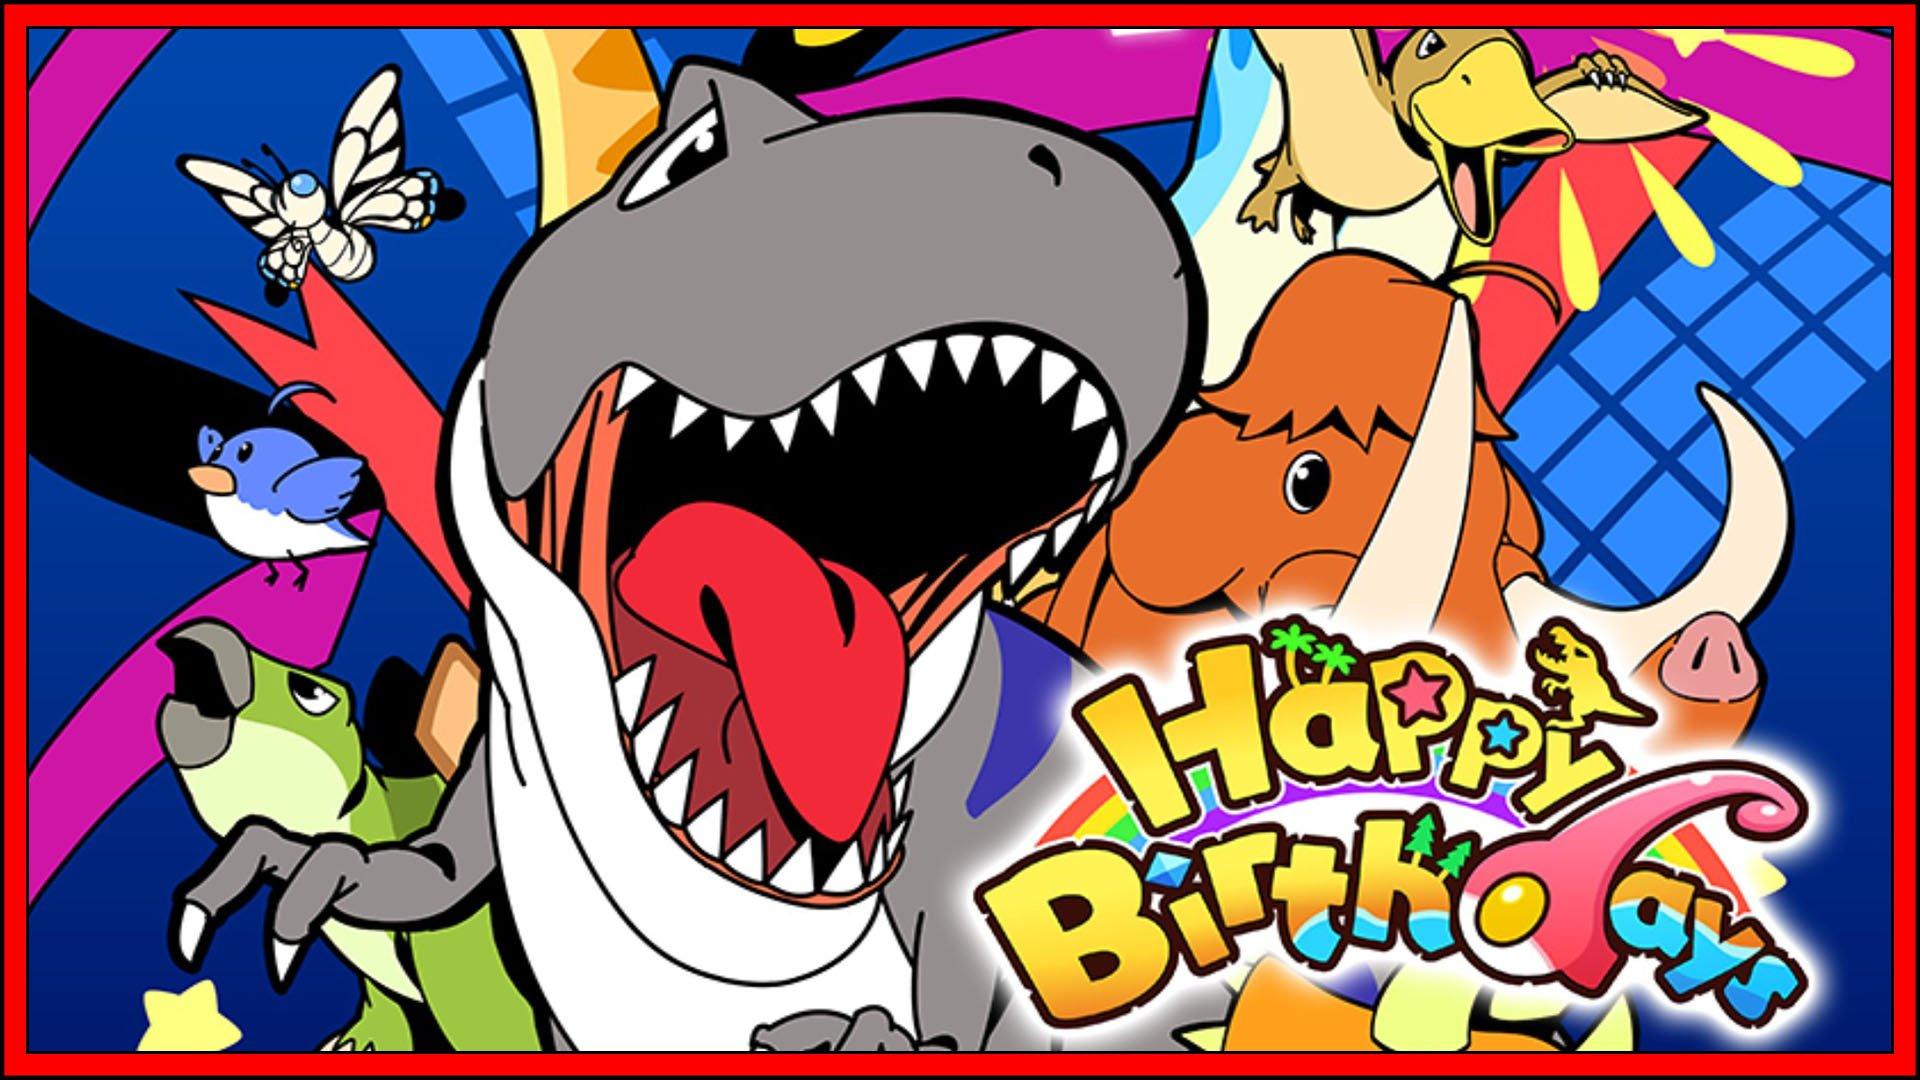 Happy Birthdays Fi3